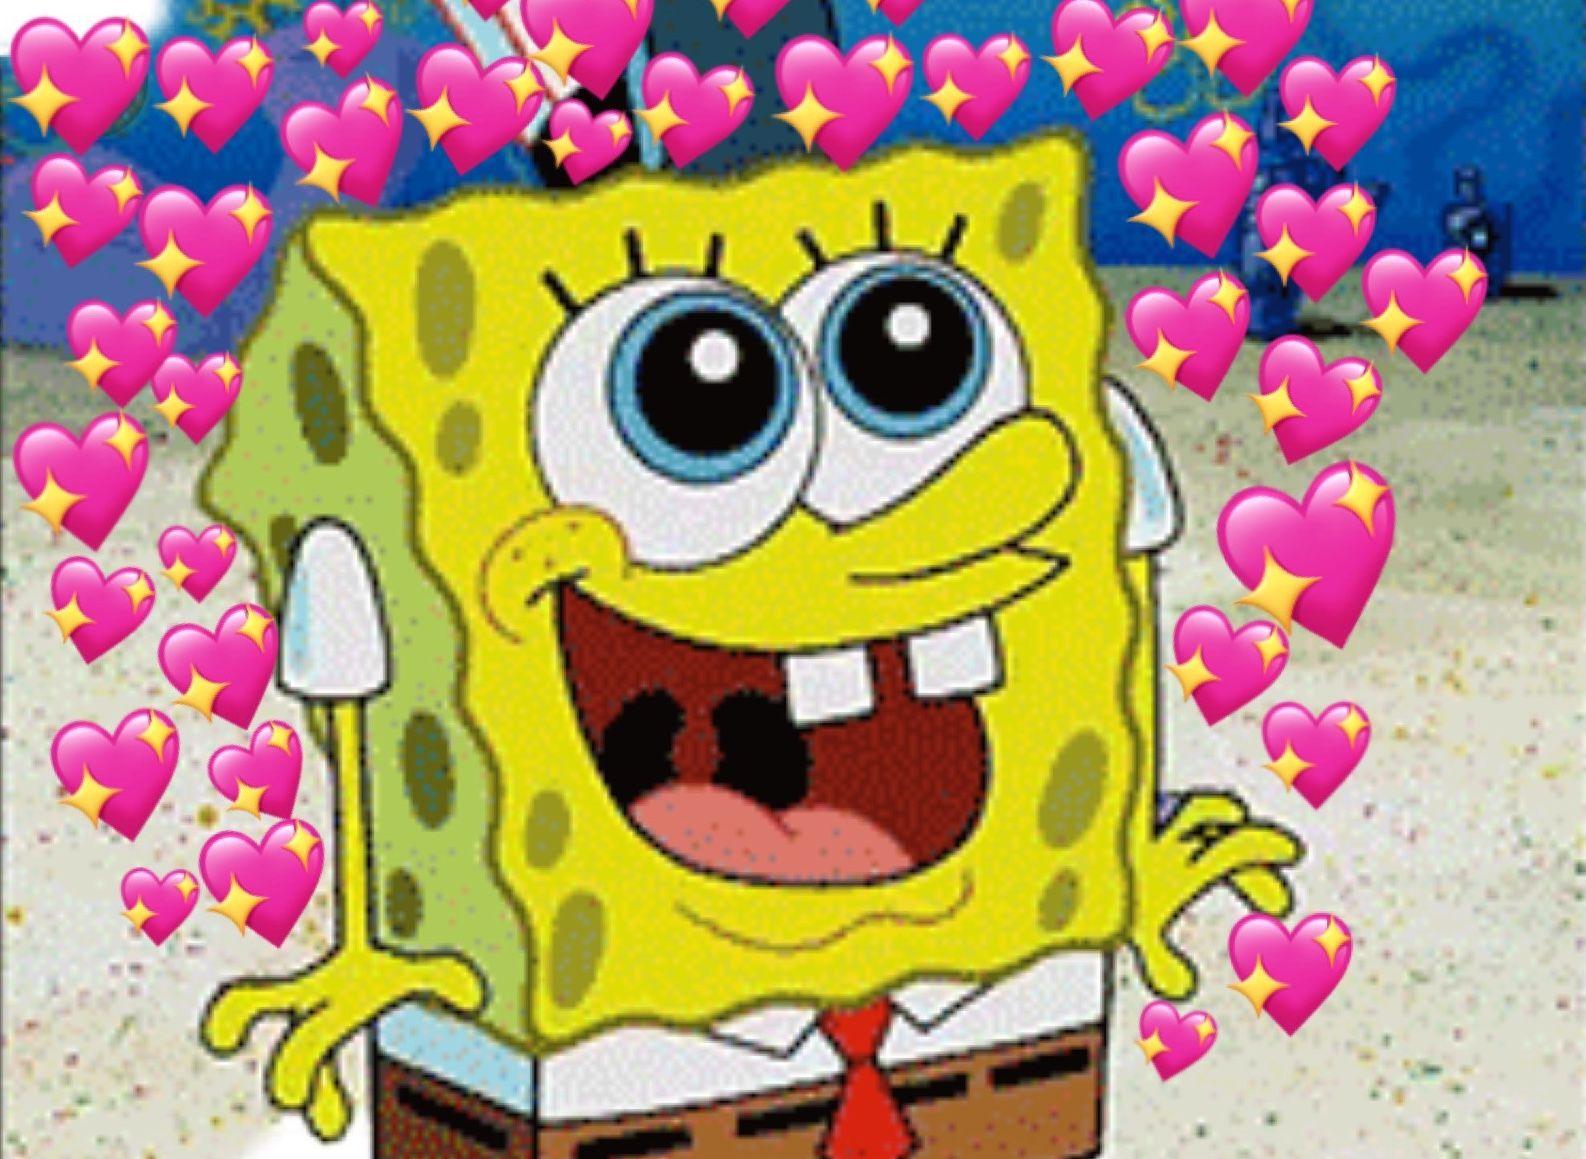 Aesthetic SpongeBob SquarePants loveeeeeee yellow mood